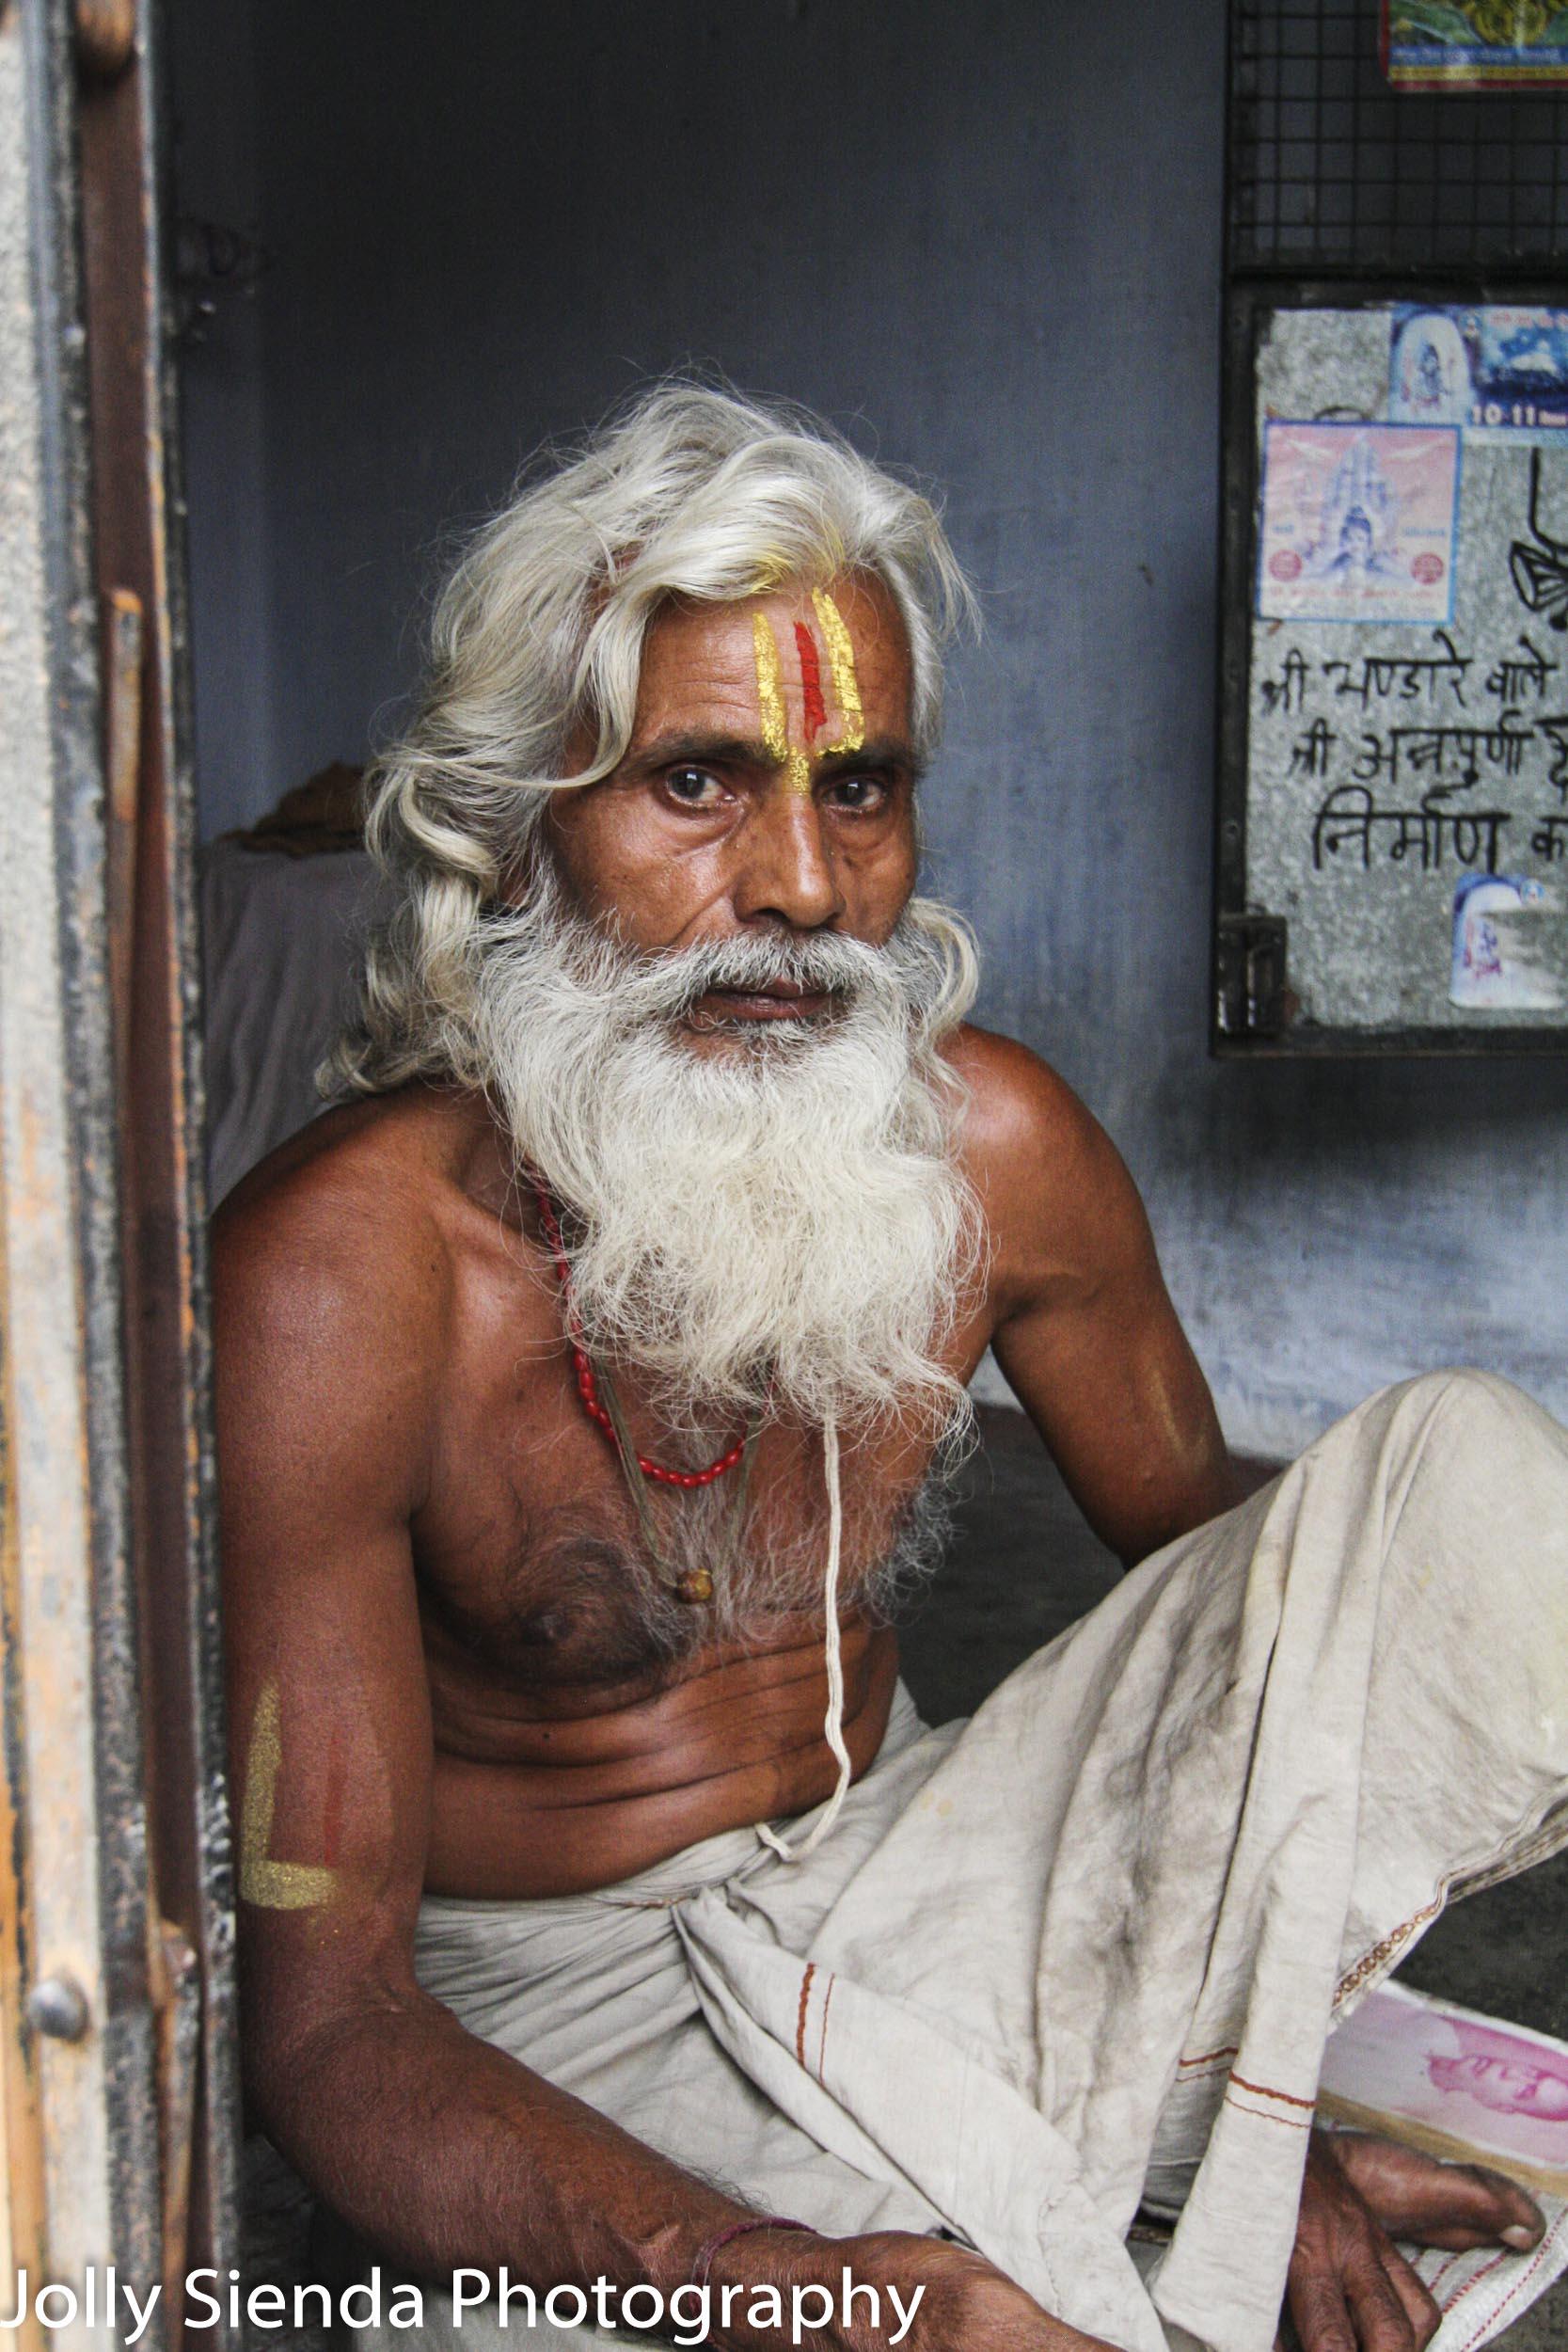 Sanskrit Reader, Portrait Photography, India